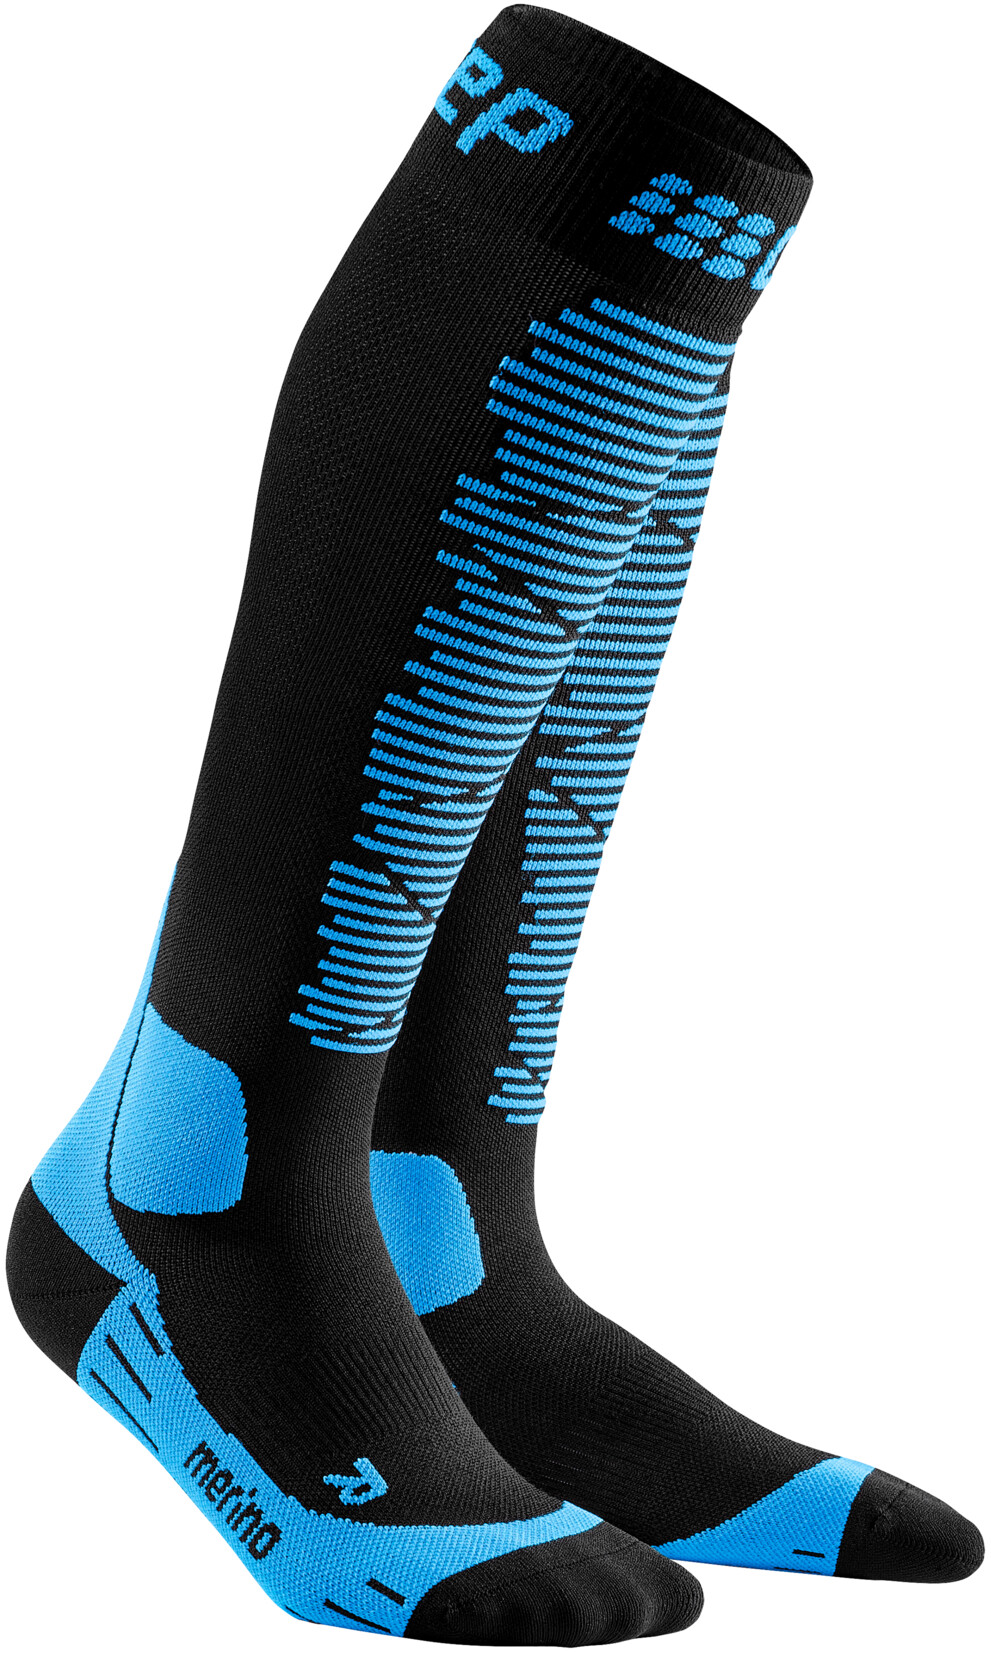 Herren Skisocken Snowboard Socken Winter Wandern Warm Socken EU 42-45